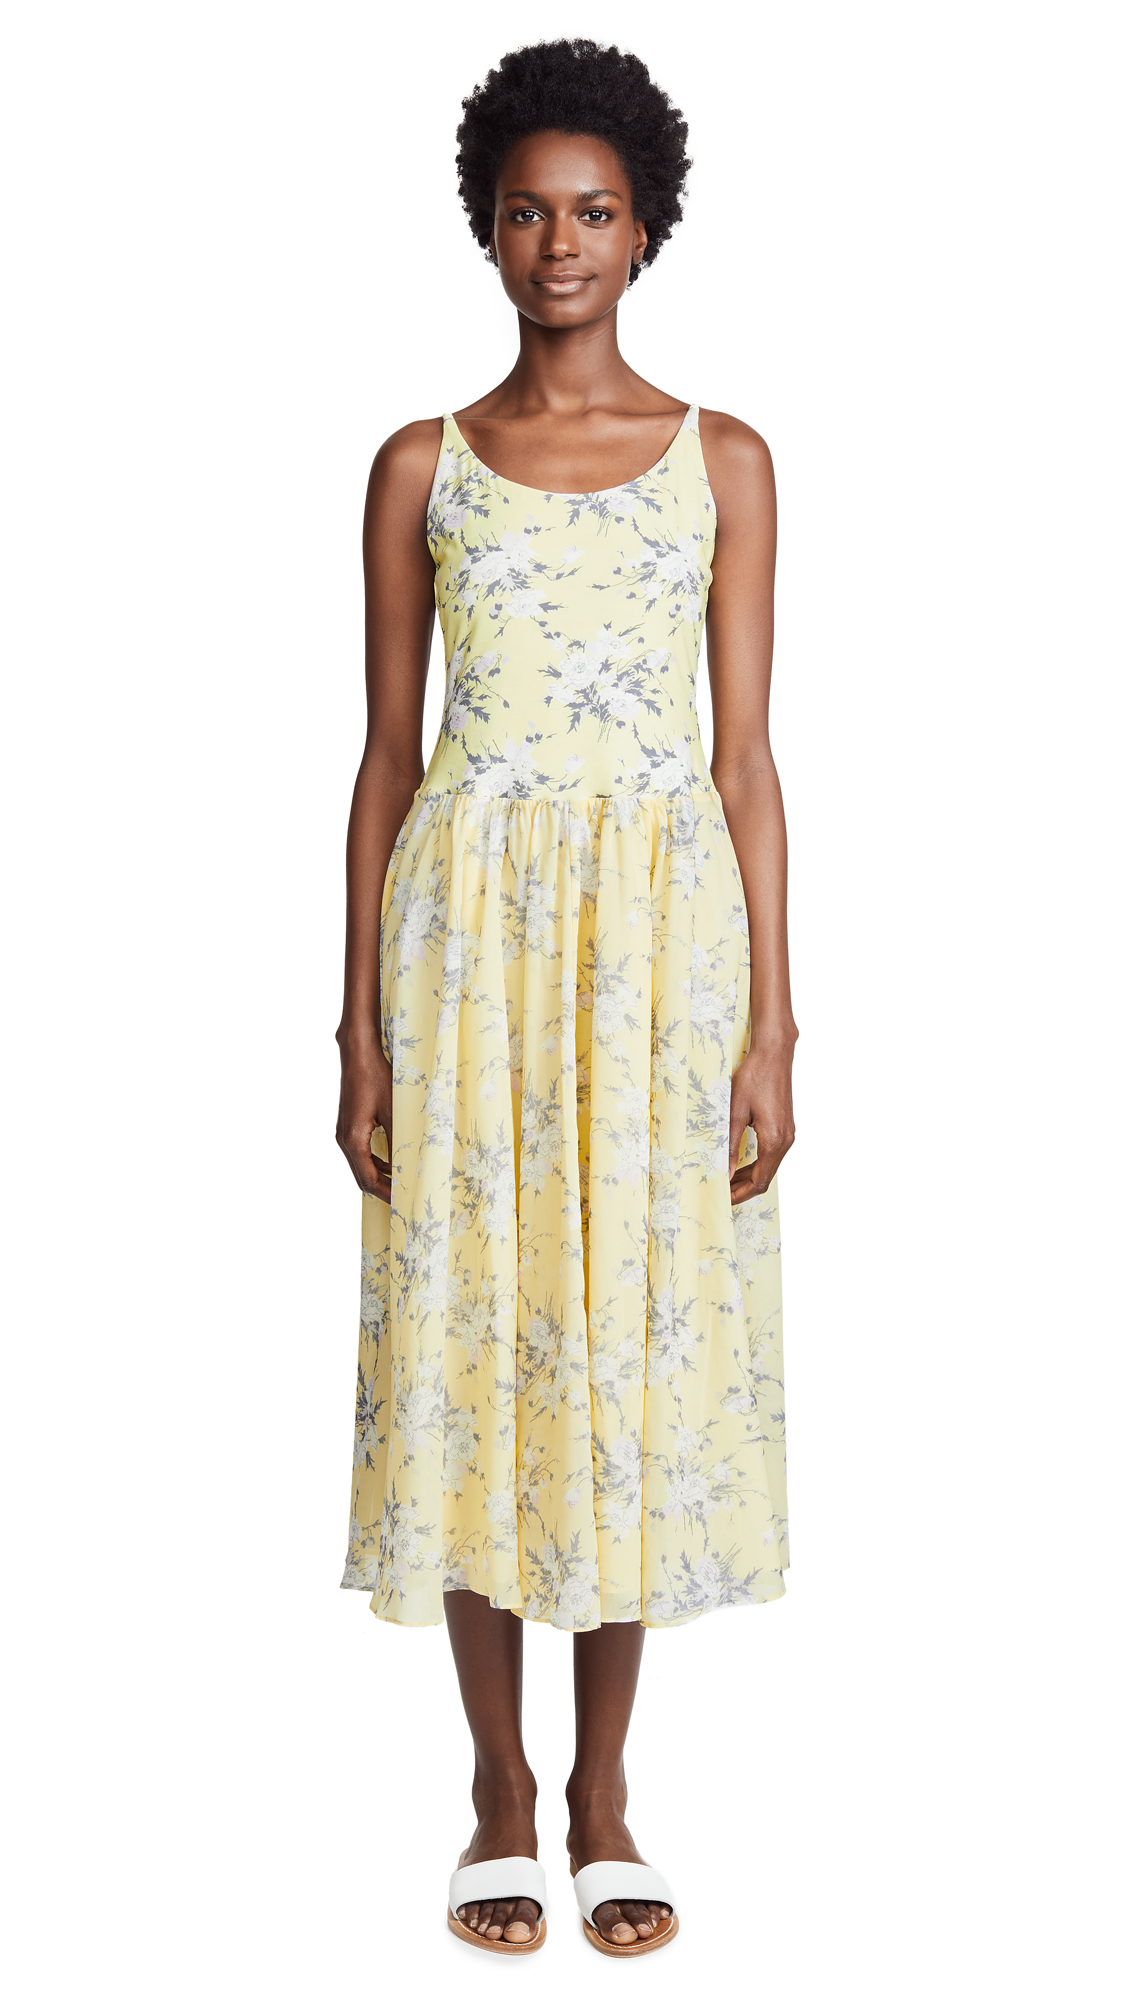 Rebecca Taylor Lemon Jersey Dress